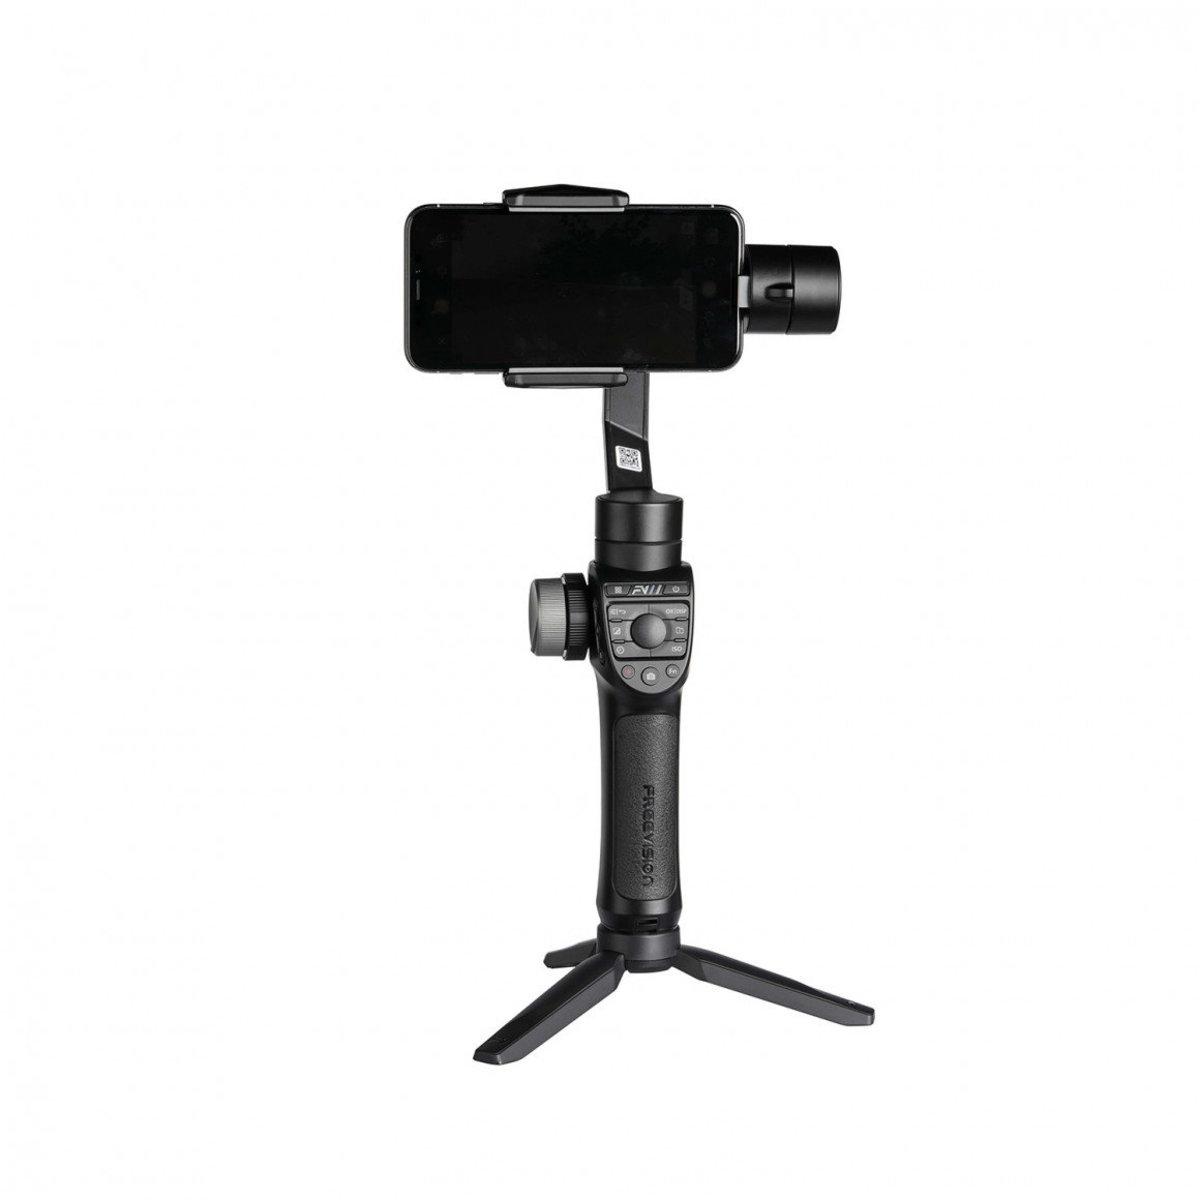 [HK Warranty] Vilta-M Pro Premium 3-Axis Gimbal Stabilizer for Smartphone